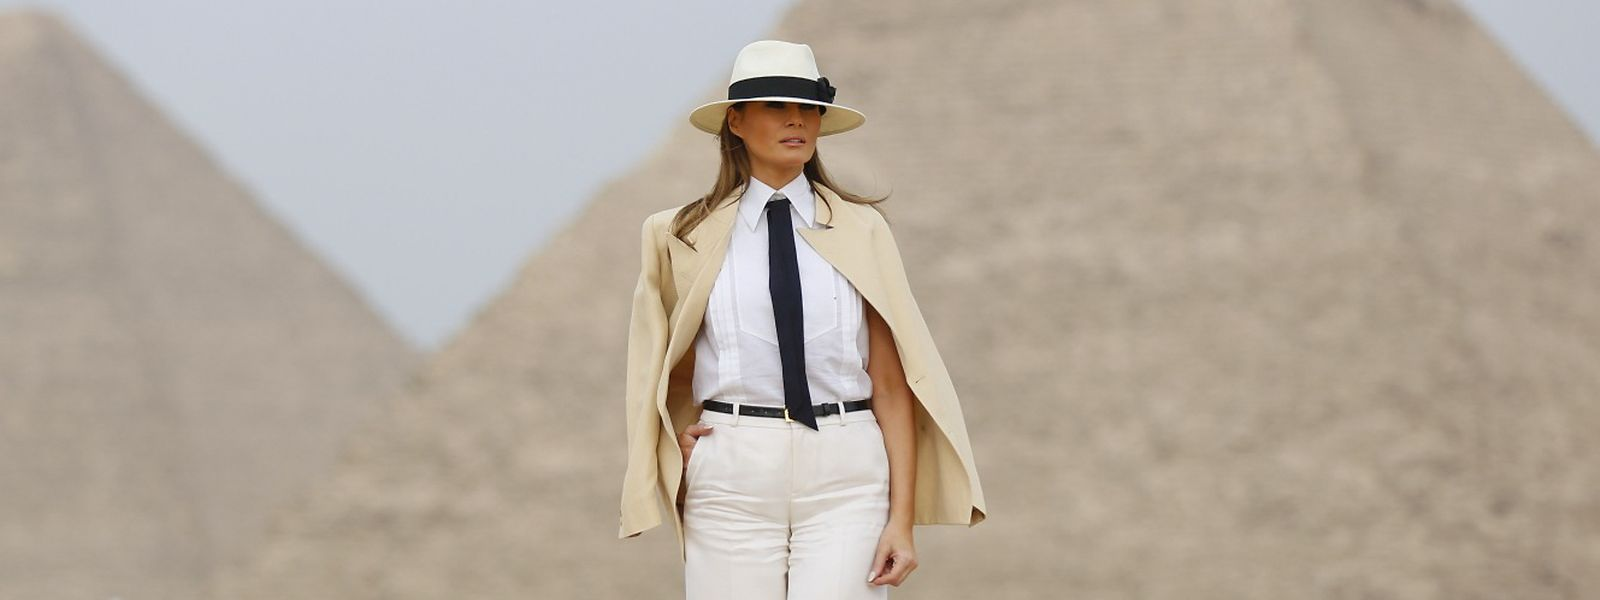 In Pose vor Pyramiden: Melania Trump gilt als Stilikone.